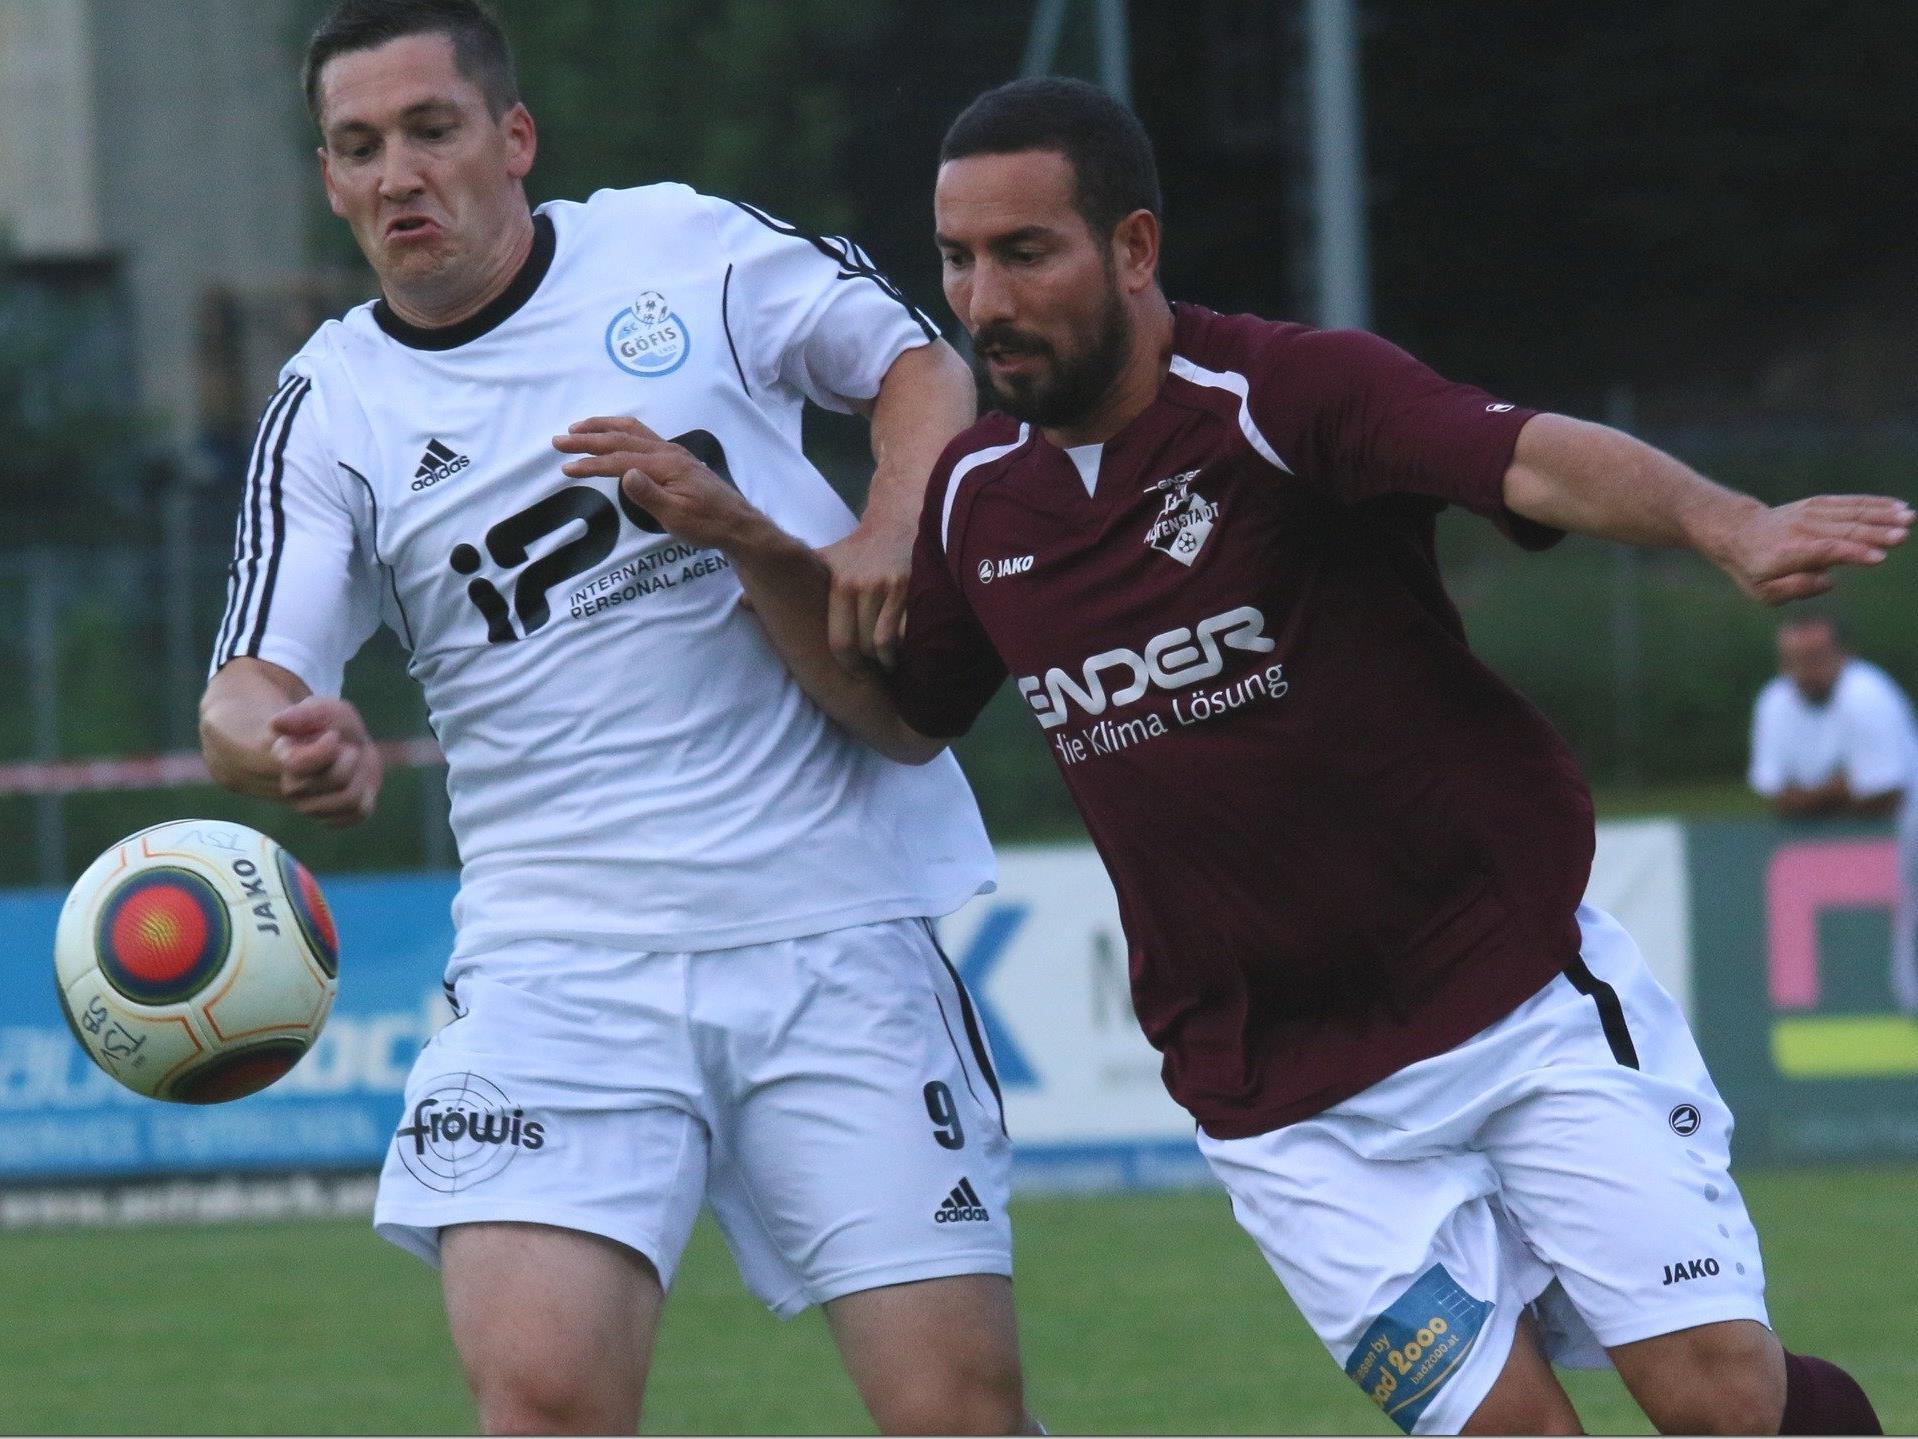 Altenstadt eliminiert Göfis im Pokal